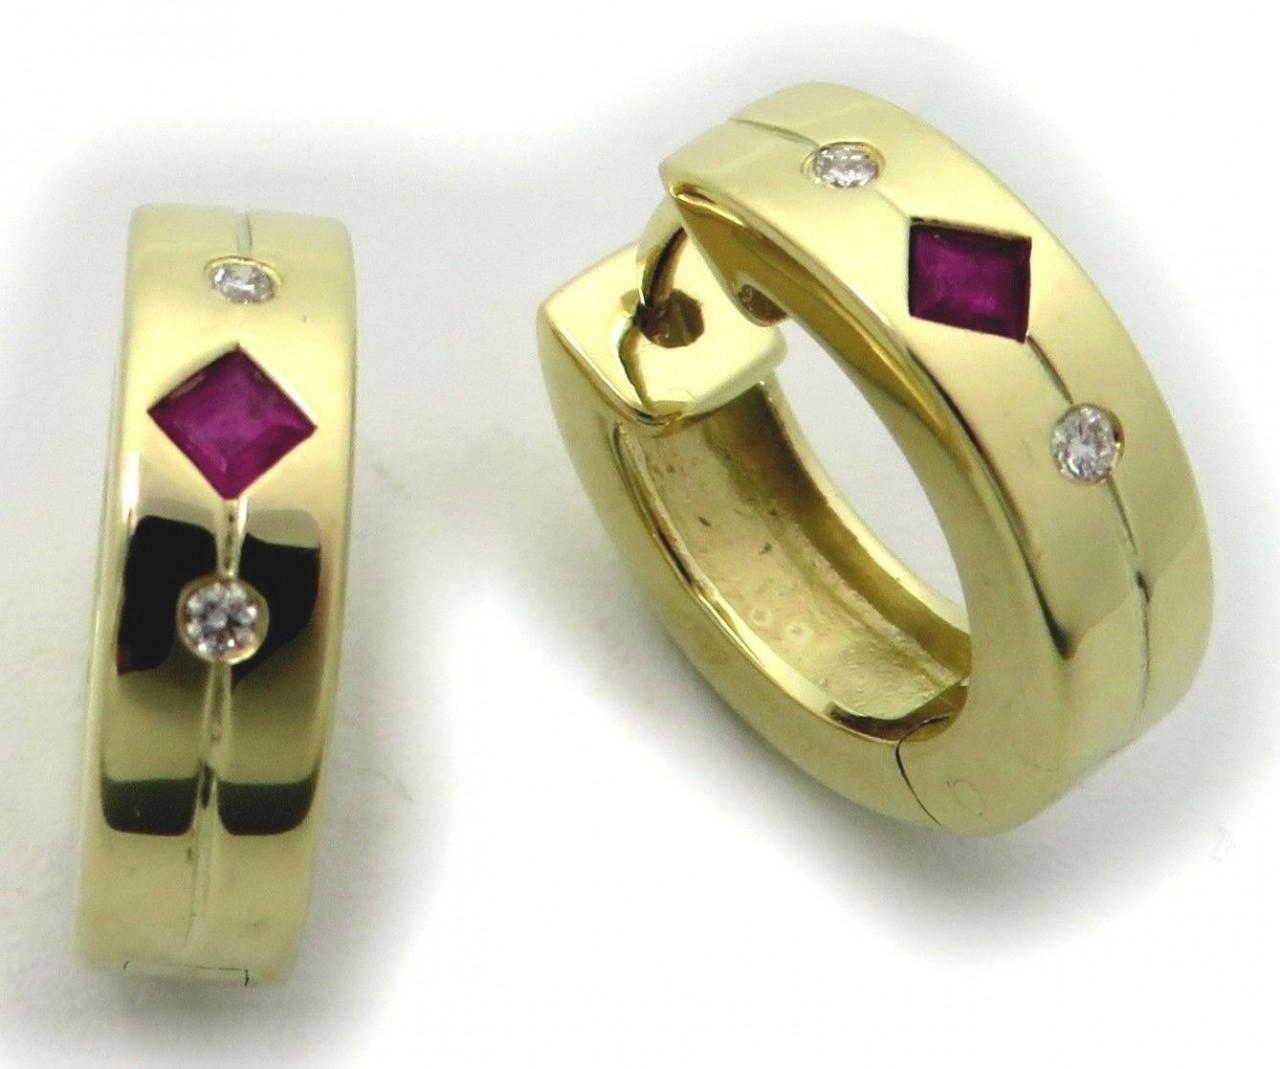 Neu Ohrringe Klapp Creolen Rubin Brillant 0,04 ct Gold 750 18kt Gelbgold Diamant